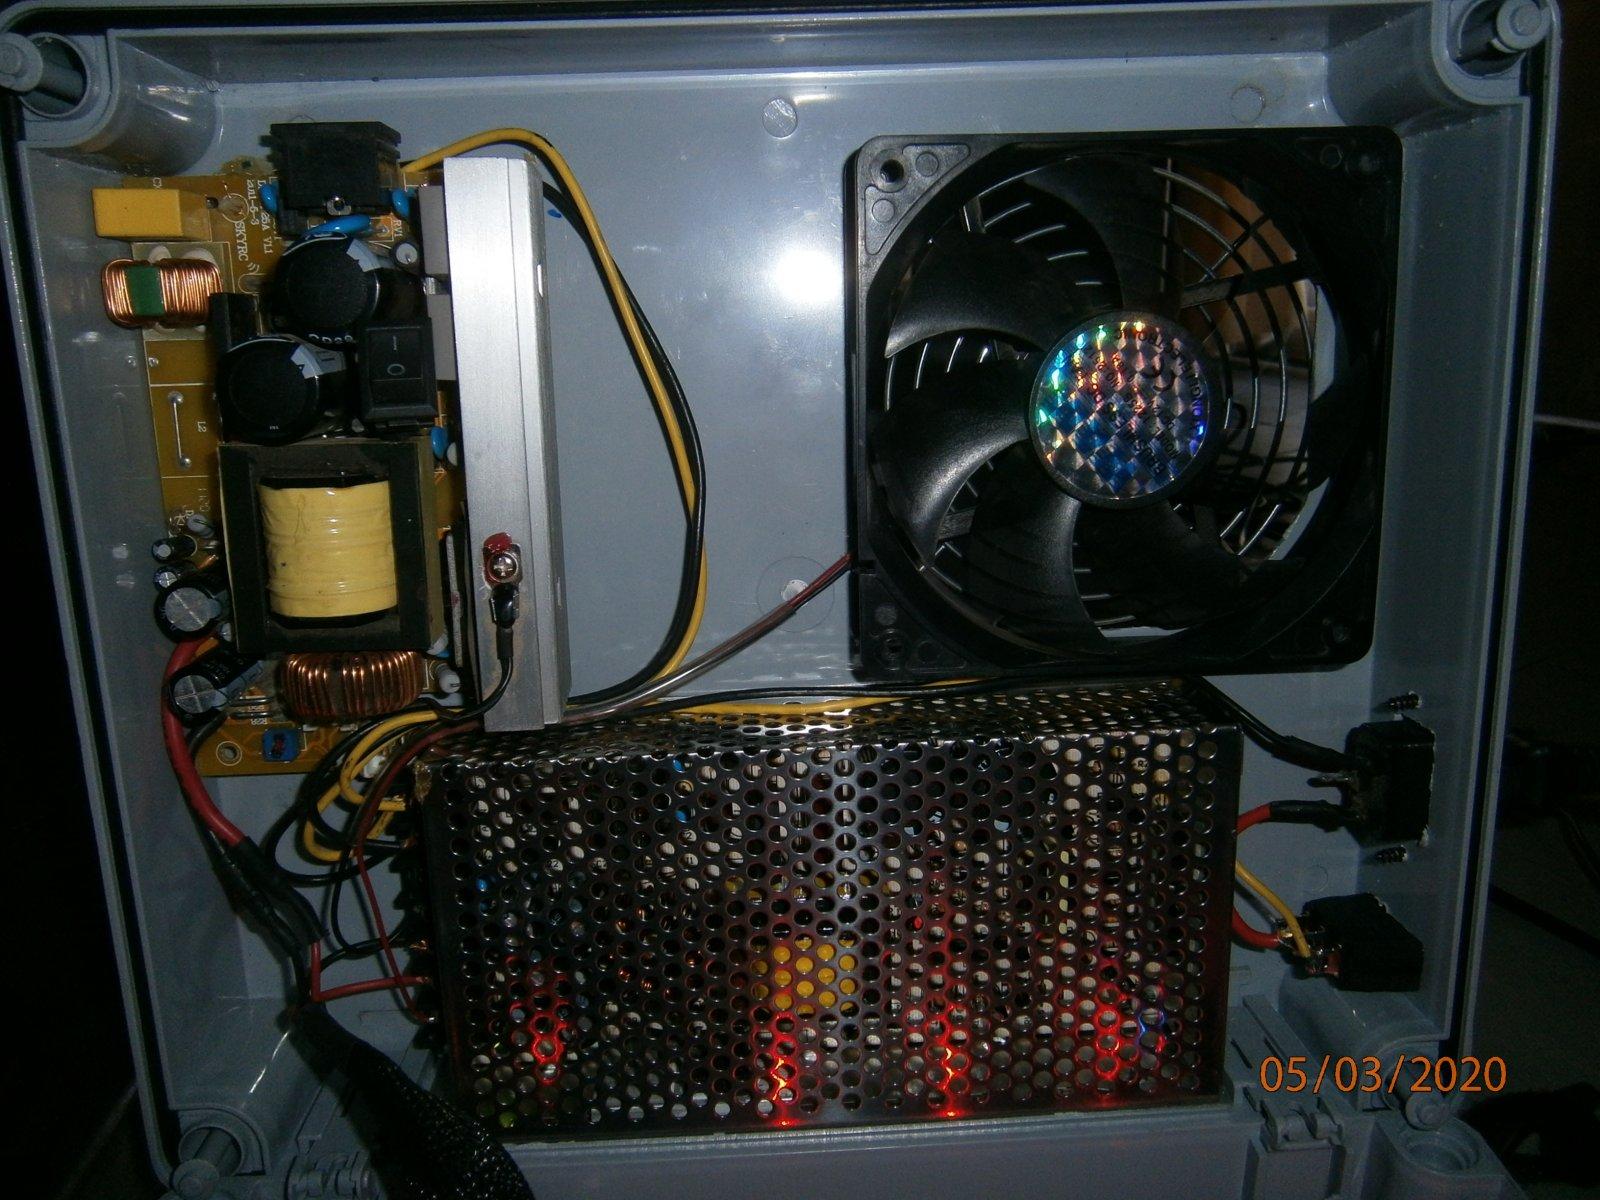 P3050006.JPG